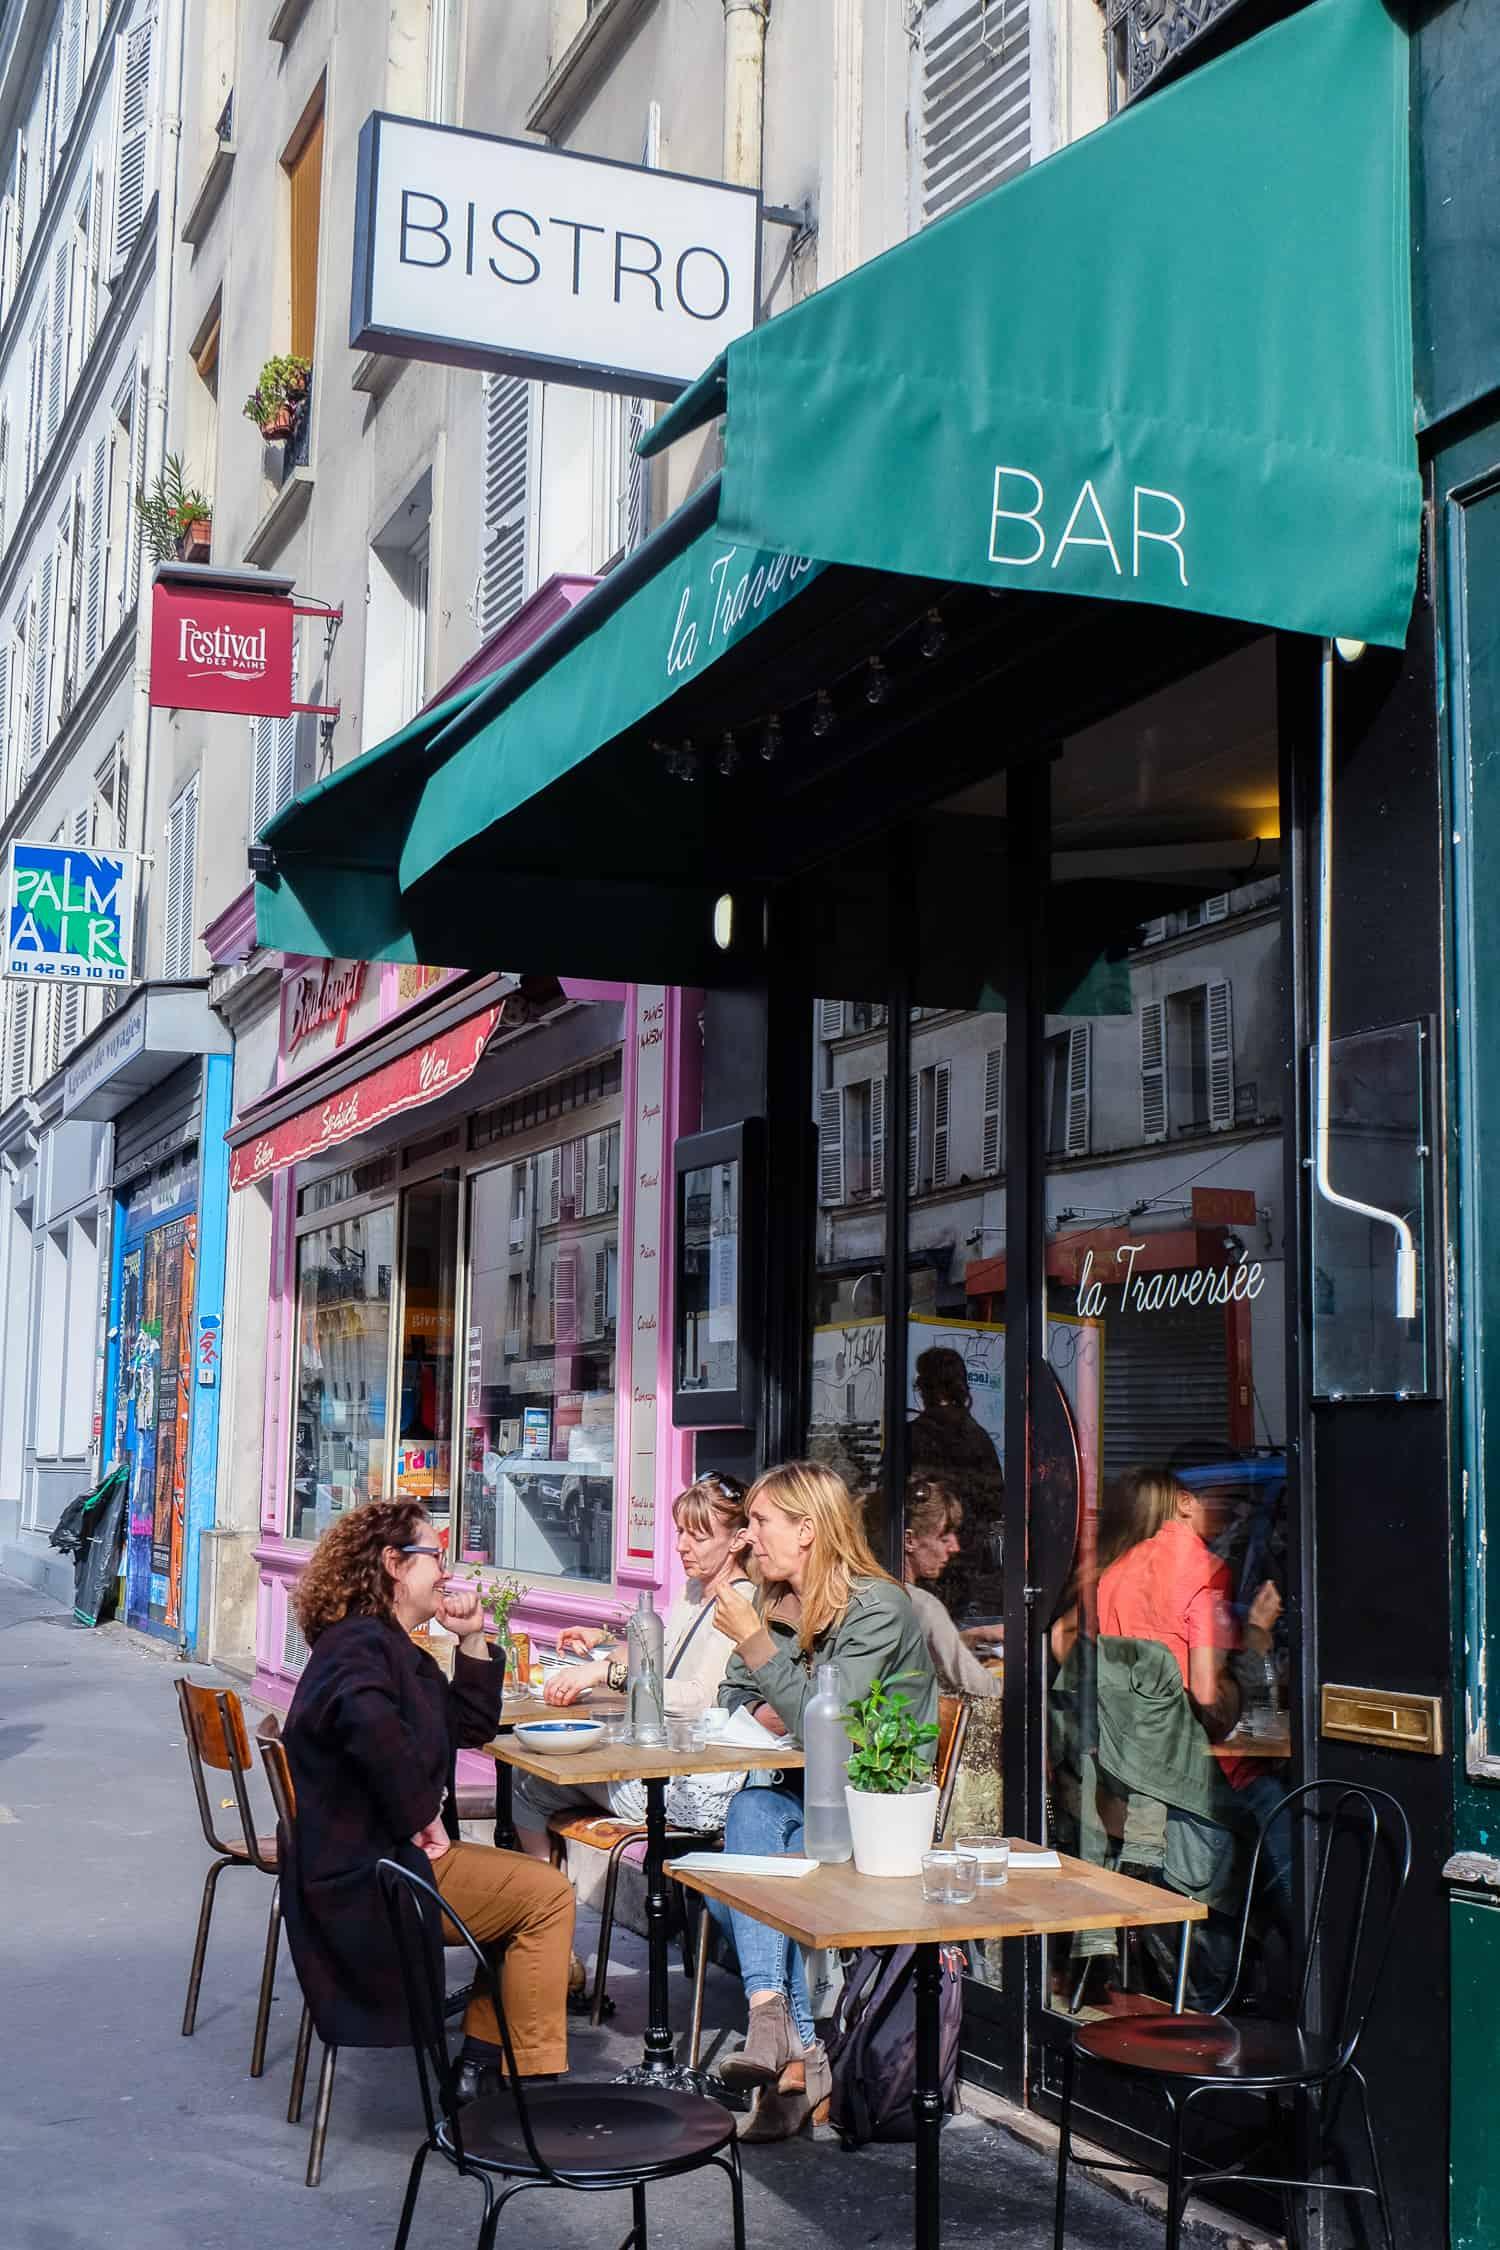 La-traversee-restaurant-paris-18-rue-ramey-15